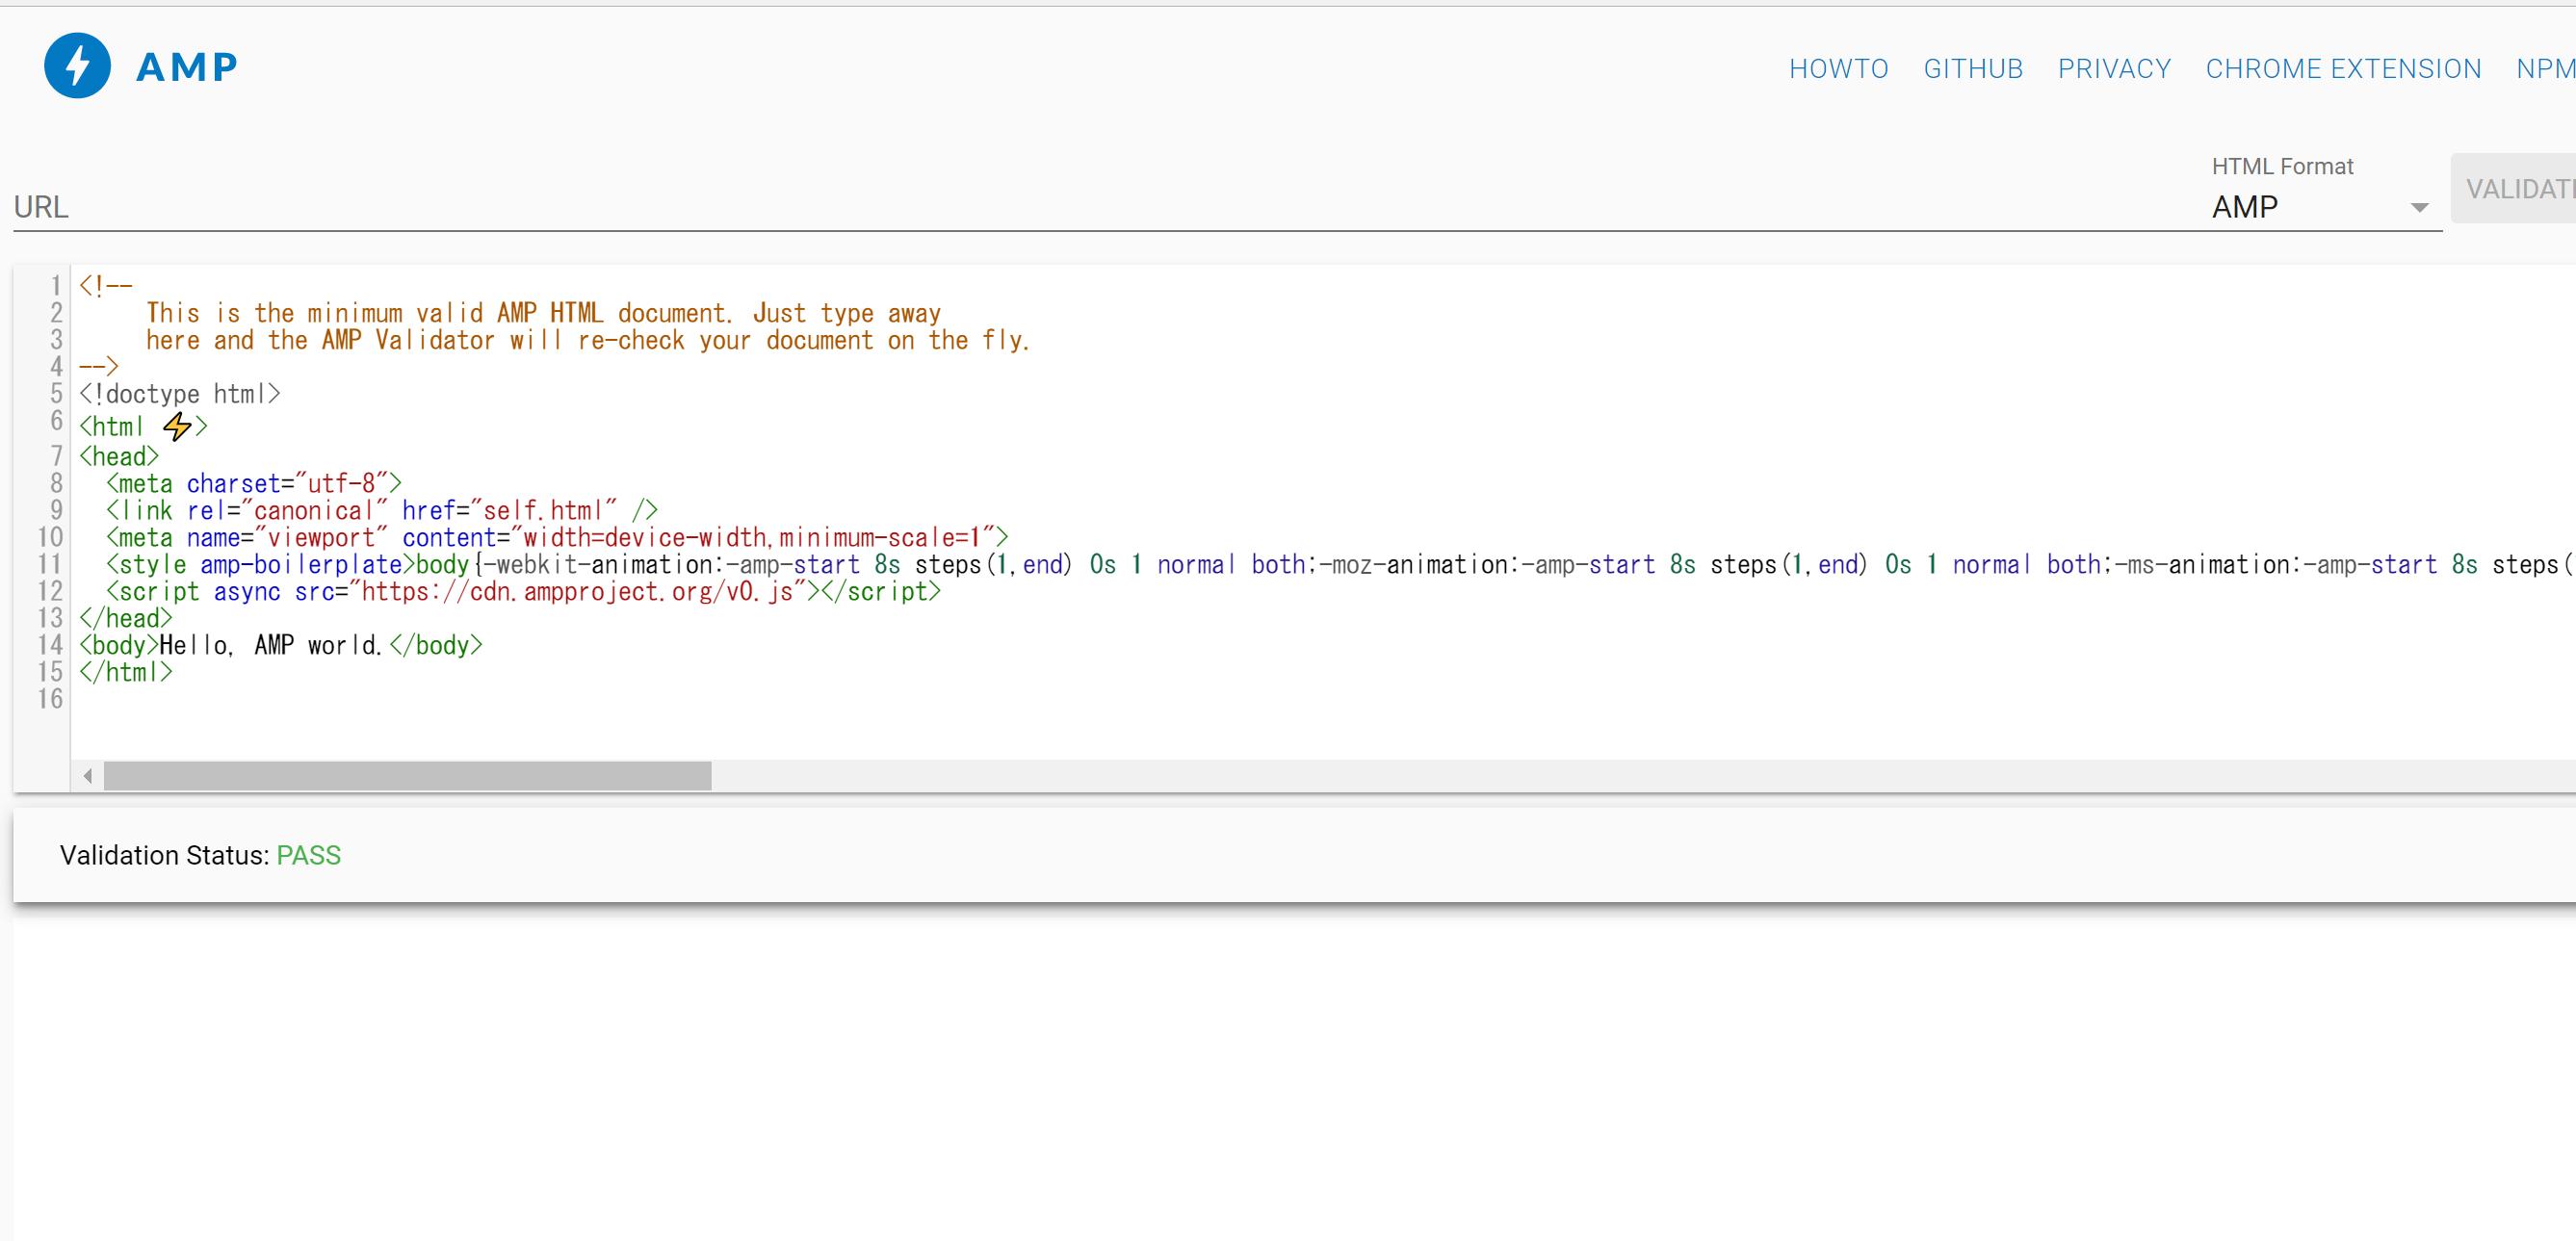 amp validator - WordPressでプラグインでAMP対応するには?メリット・デメリットは?